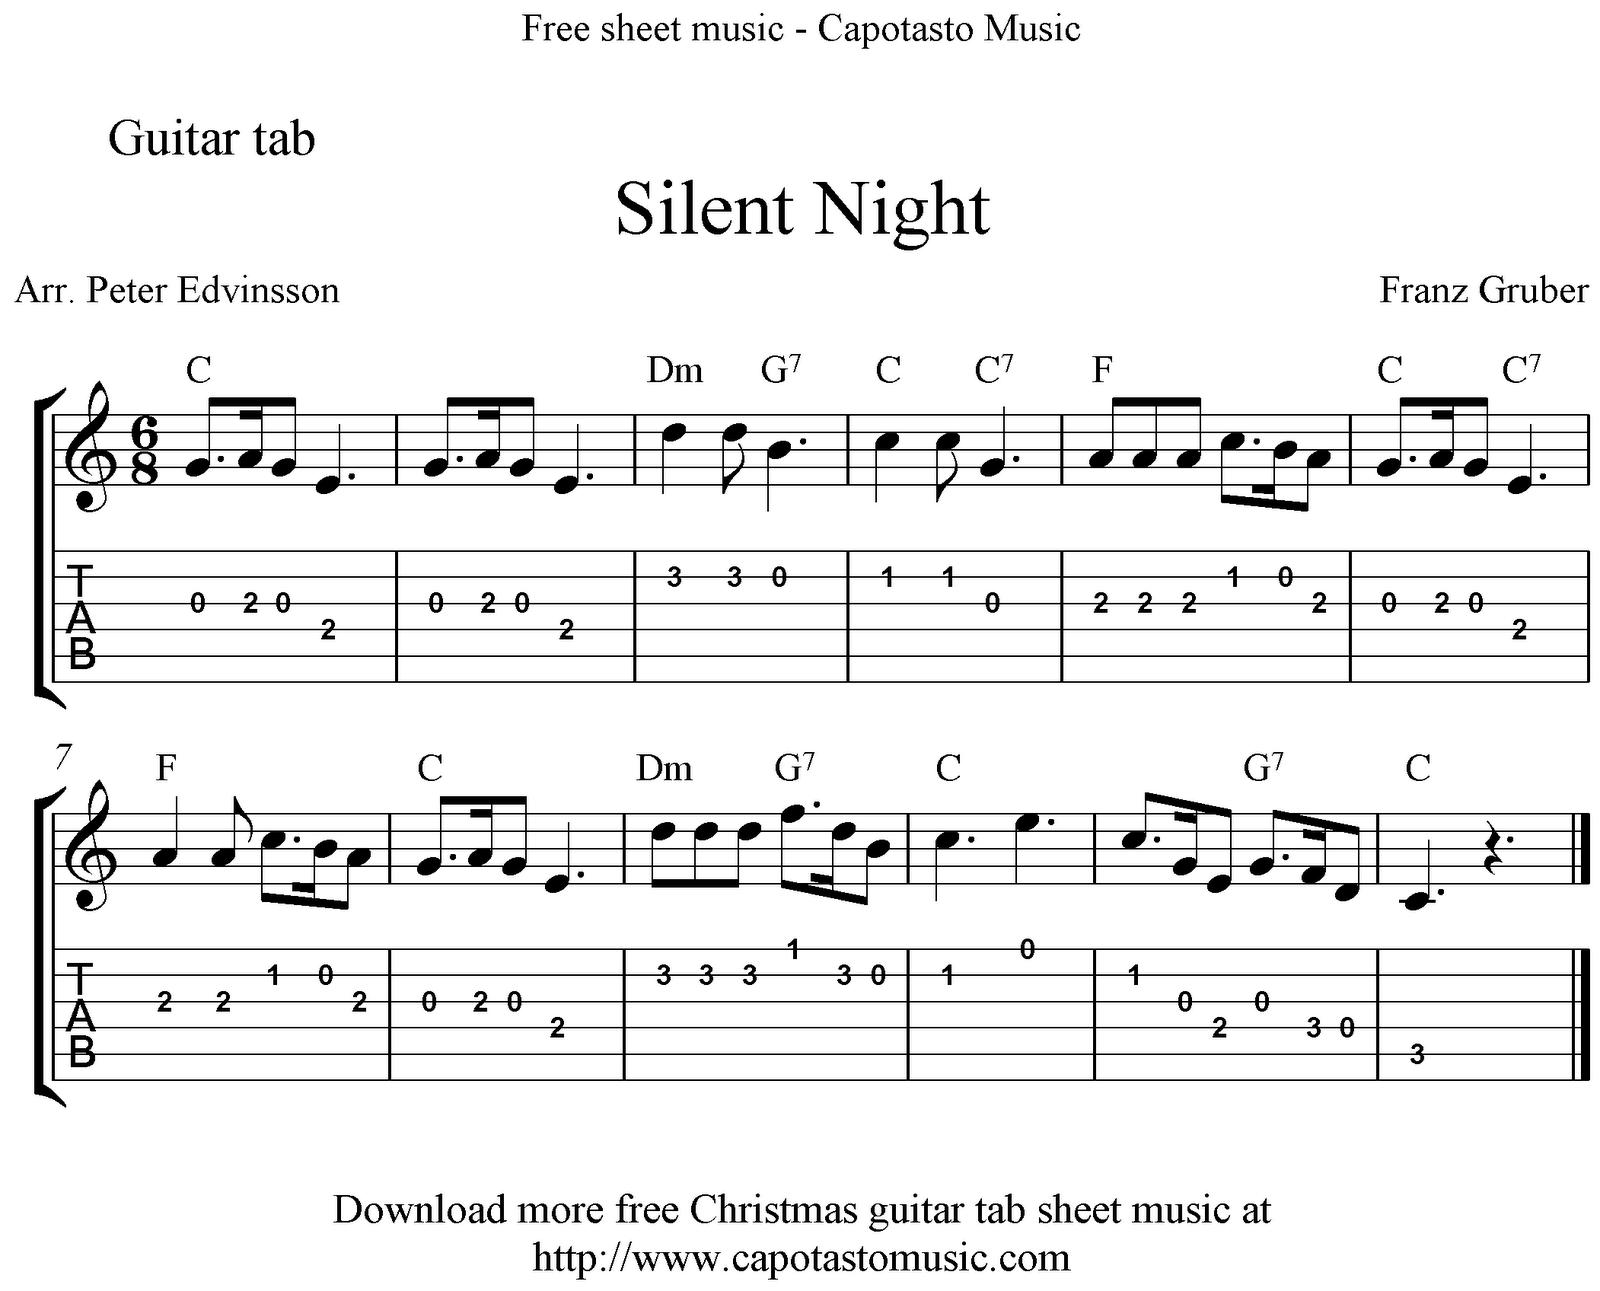 Silent Night Easy Sheet Music : Sheet Music Scores: Silent Night, easy free Christmas guitar tab ...